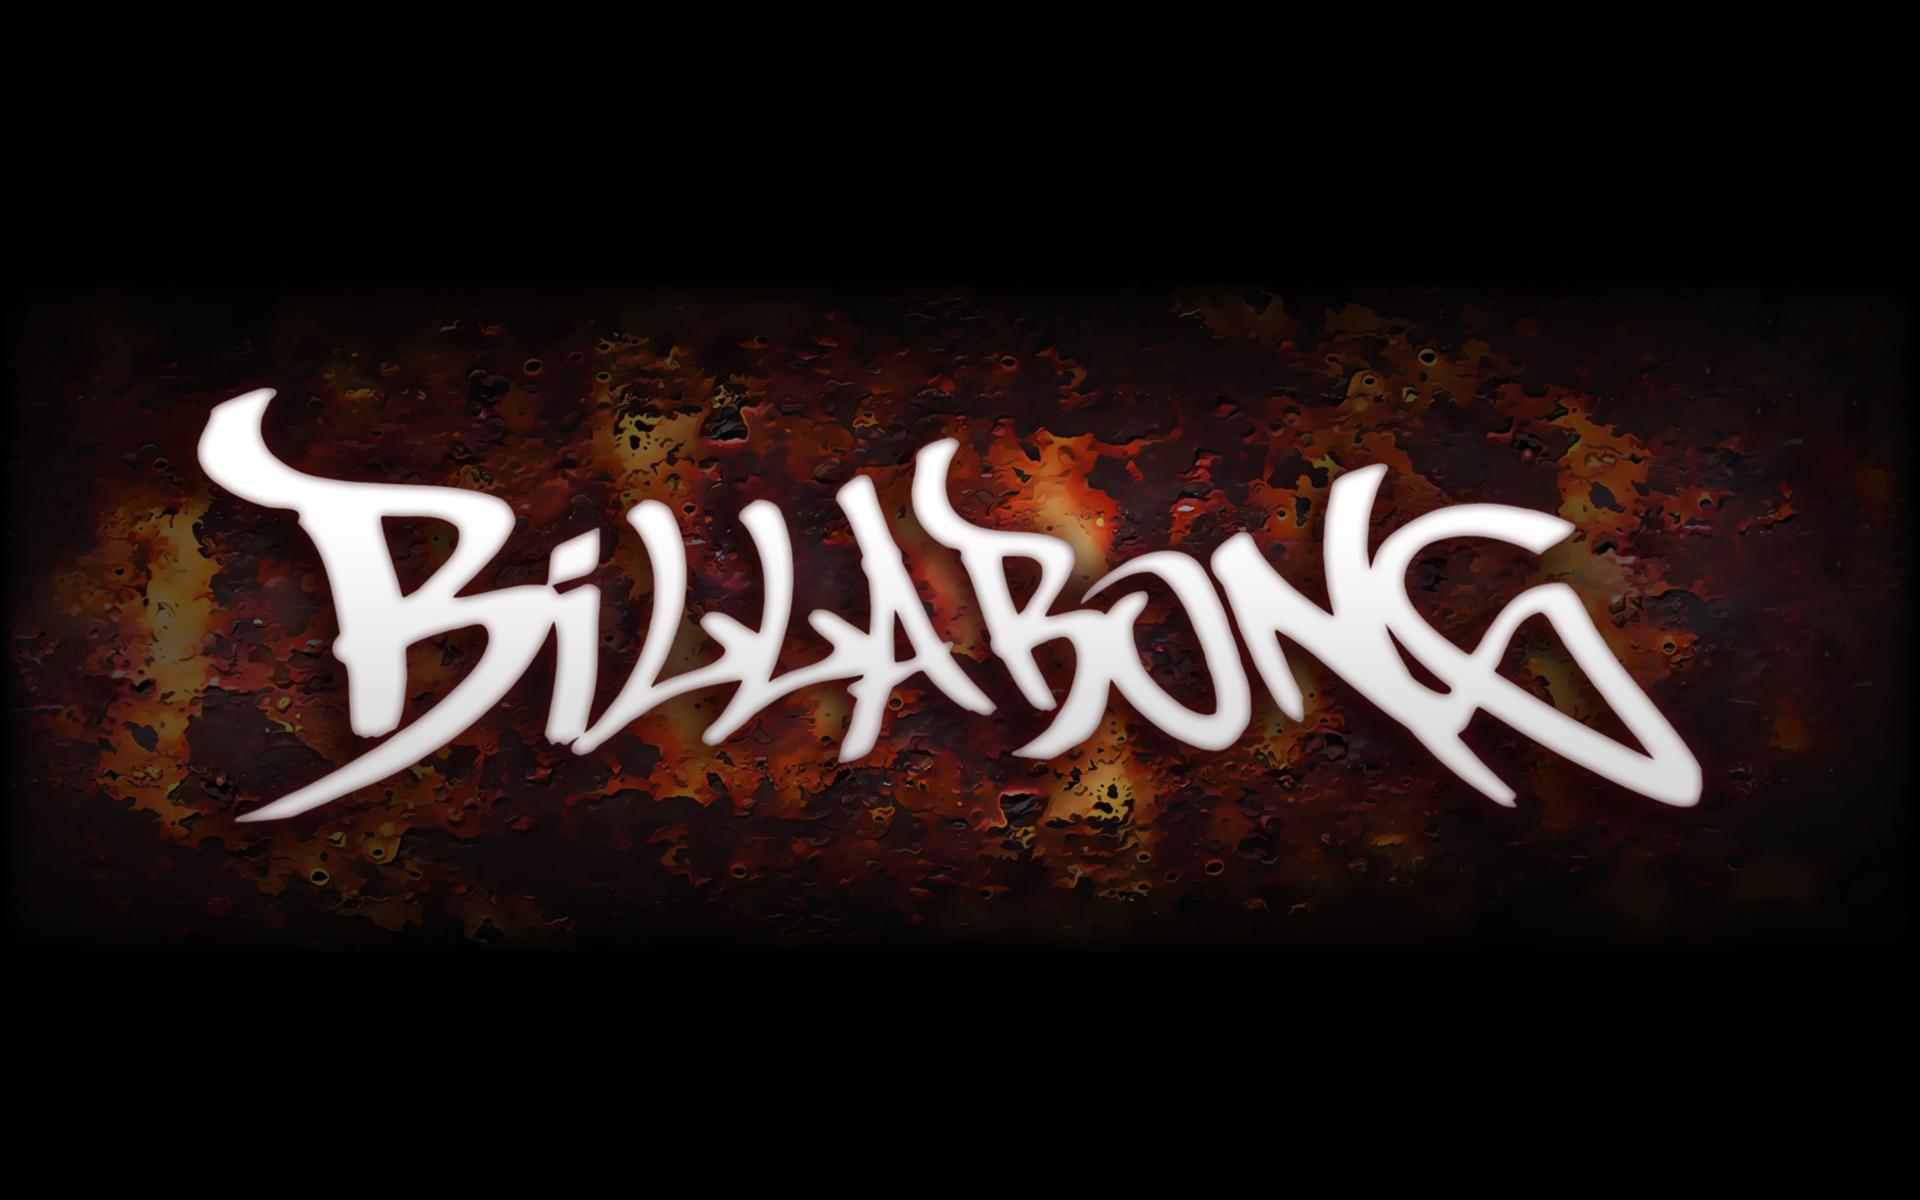 Billabong Logo Wallpaper images